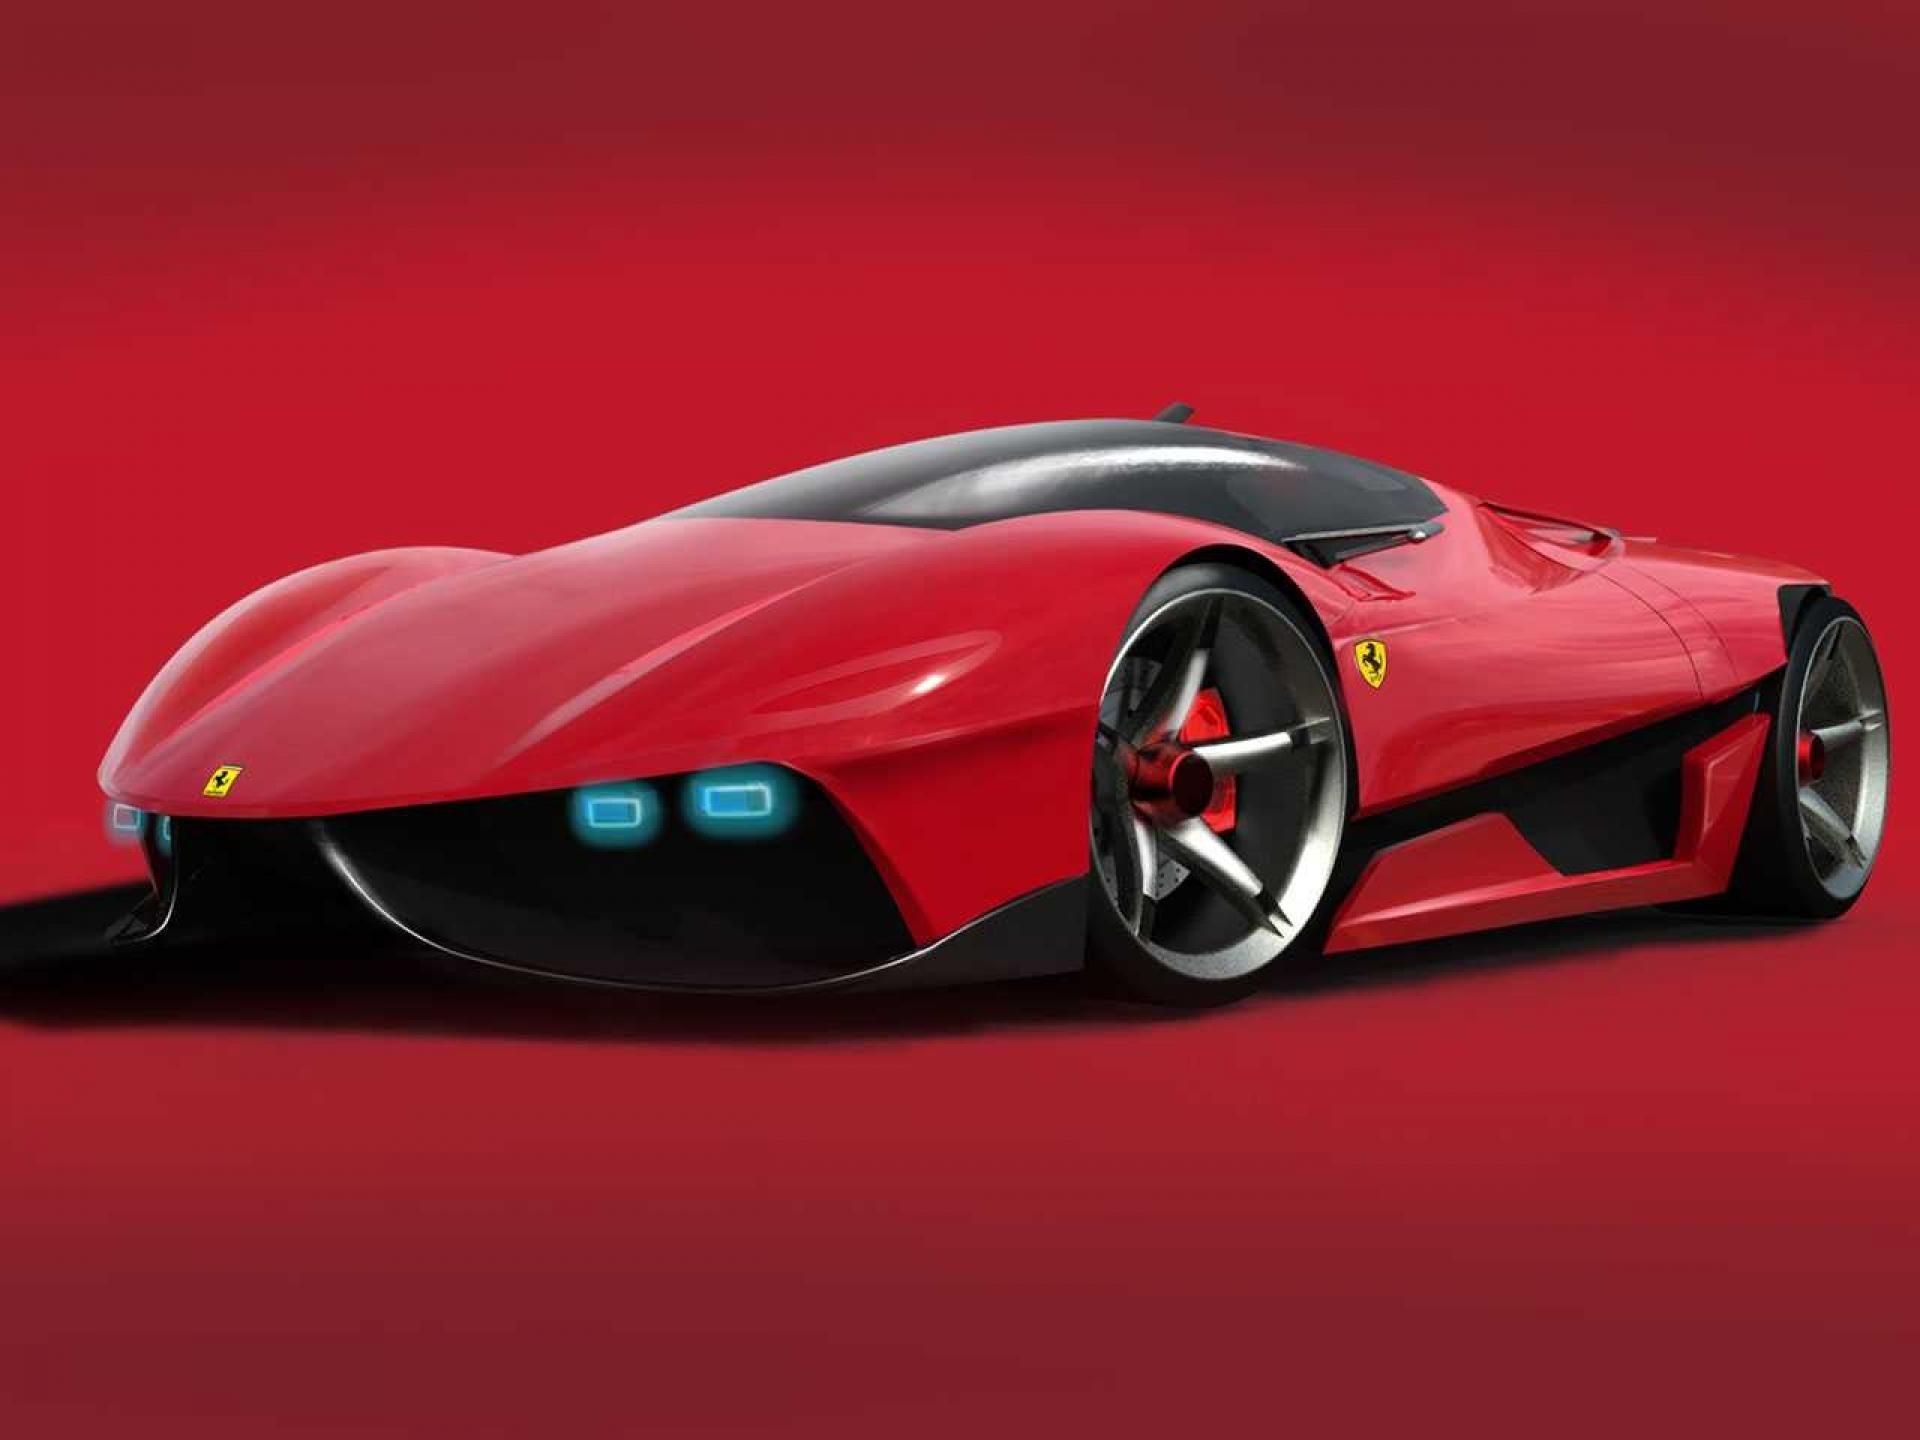 Hd Futuristic Ferrari Car Wallpaper With Images Concept Cars